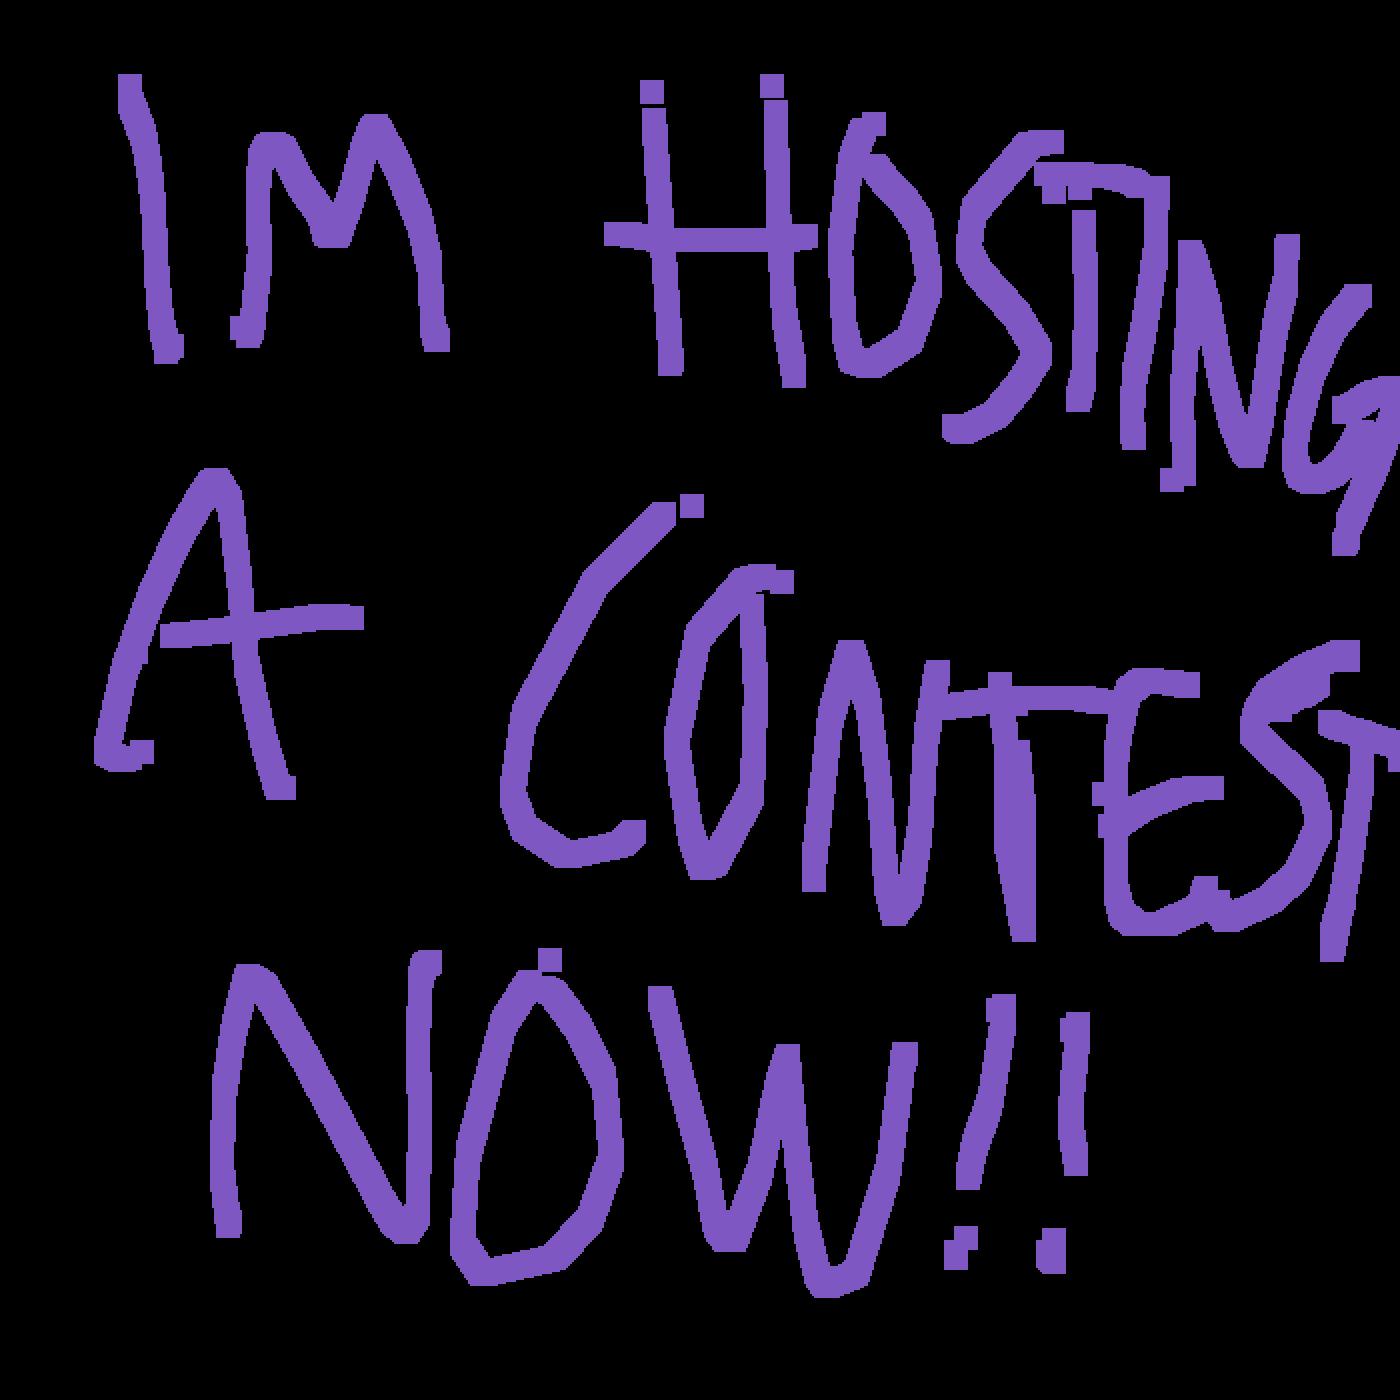 main-image-hosting a contest now....wooooo  by Broke-AF